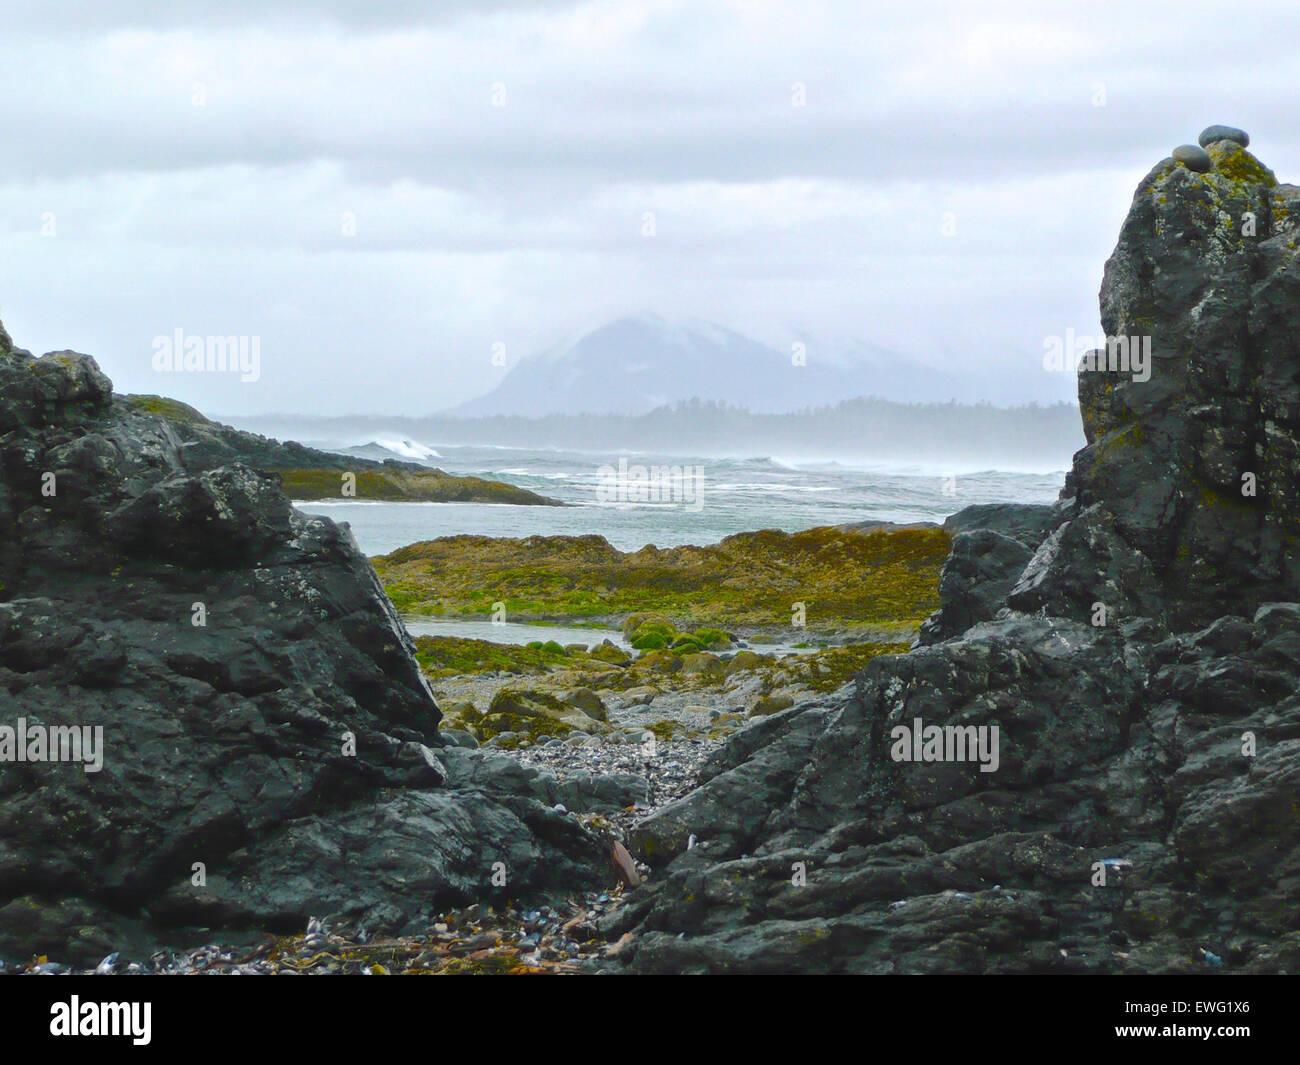 Côte rocheuse de la mer tumultueuse Photo Stock